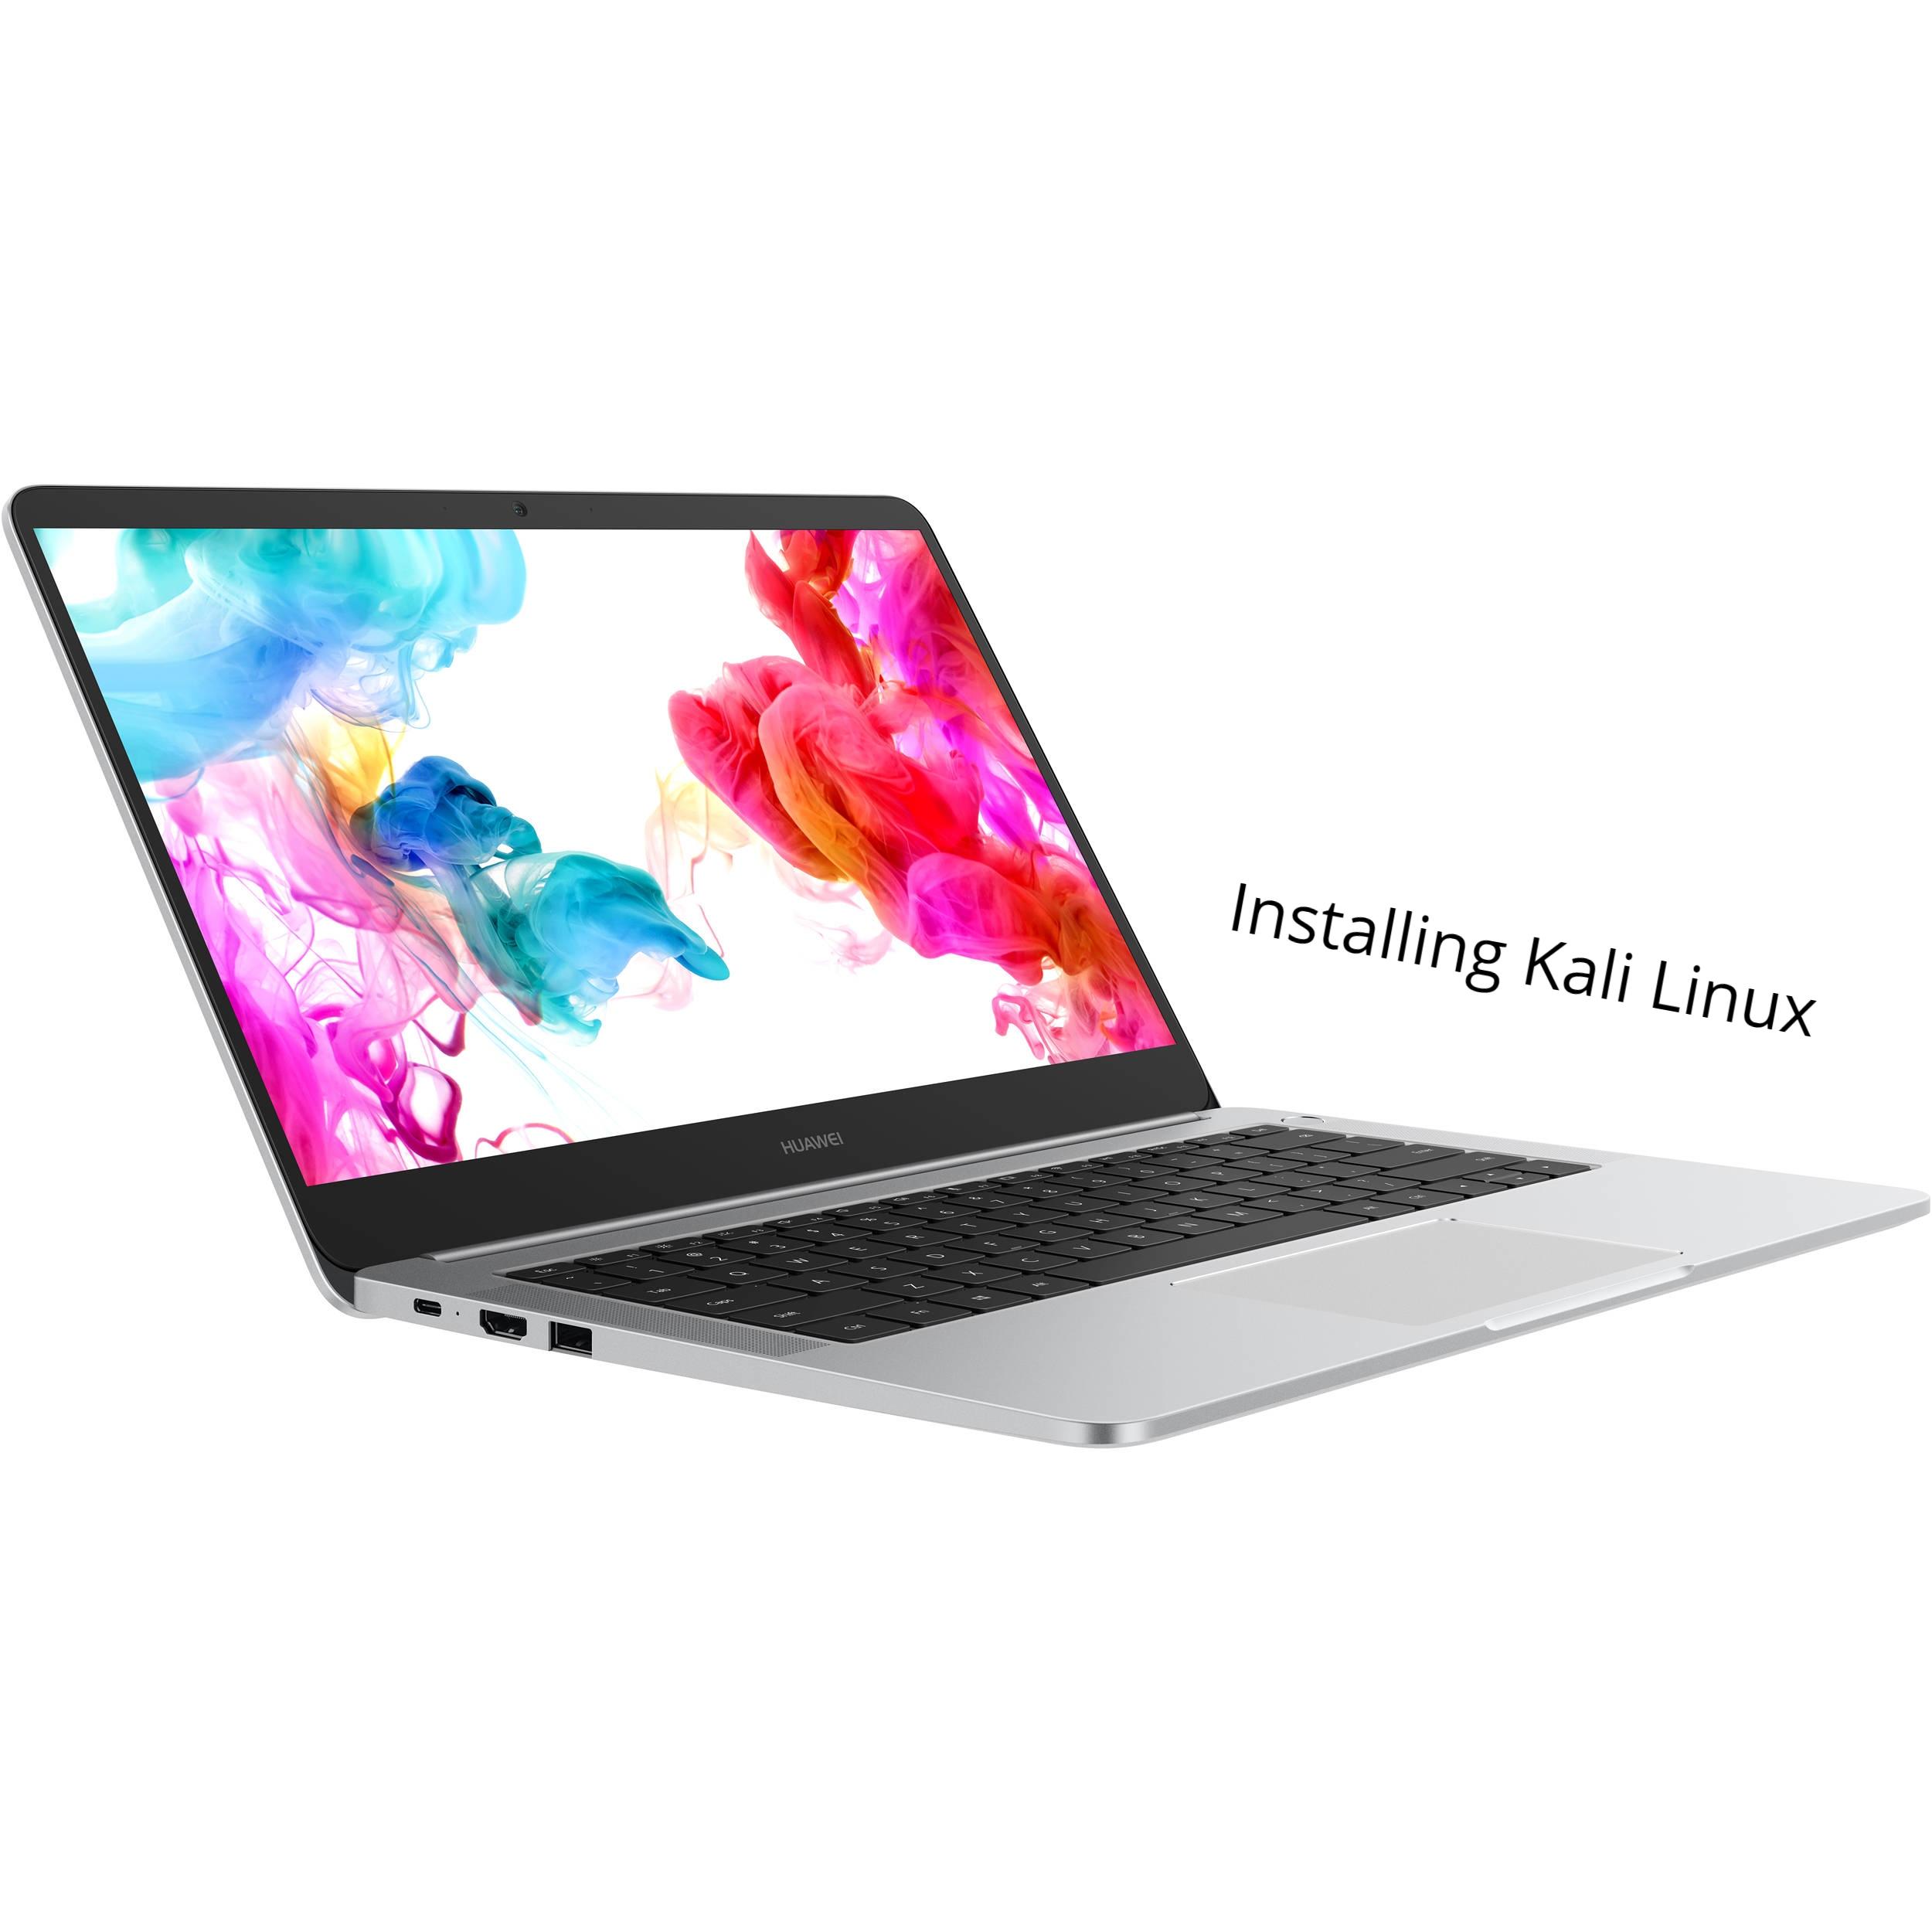 install kali Linux on Huawei matebook D